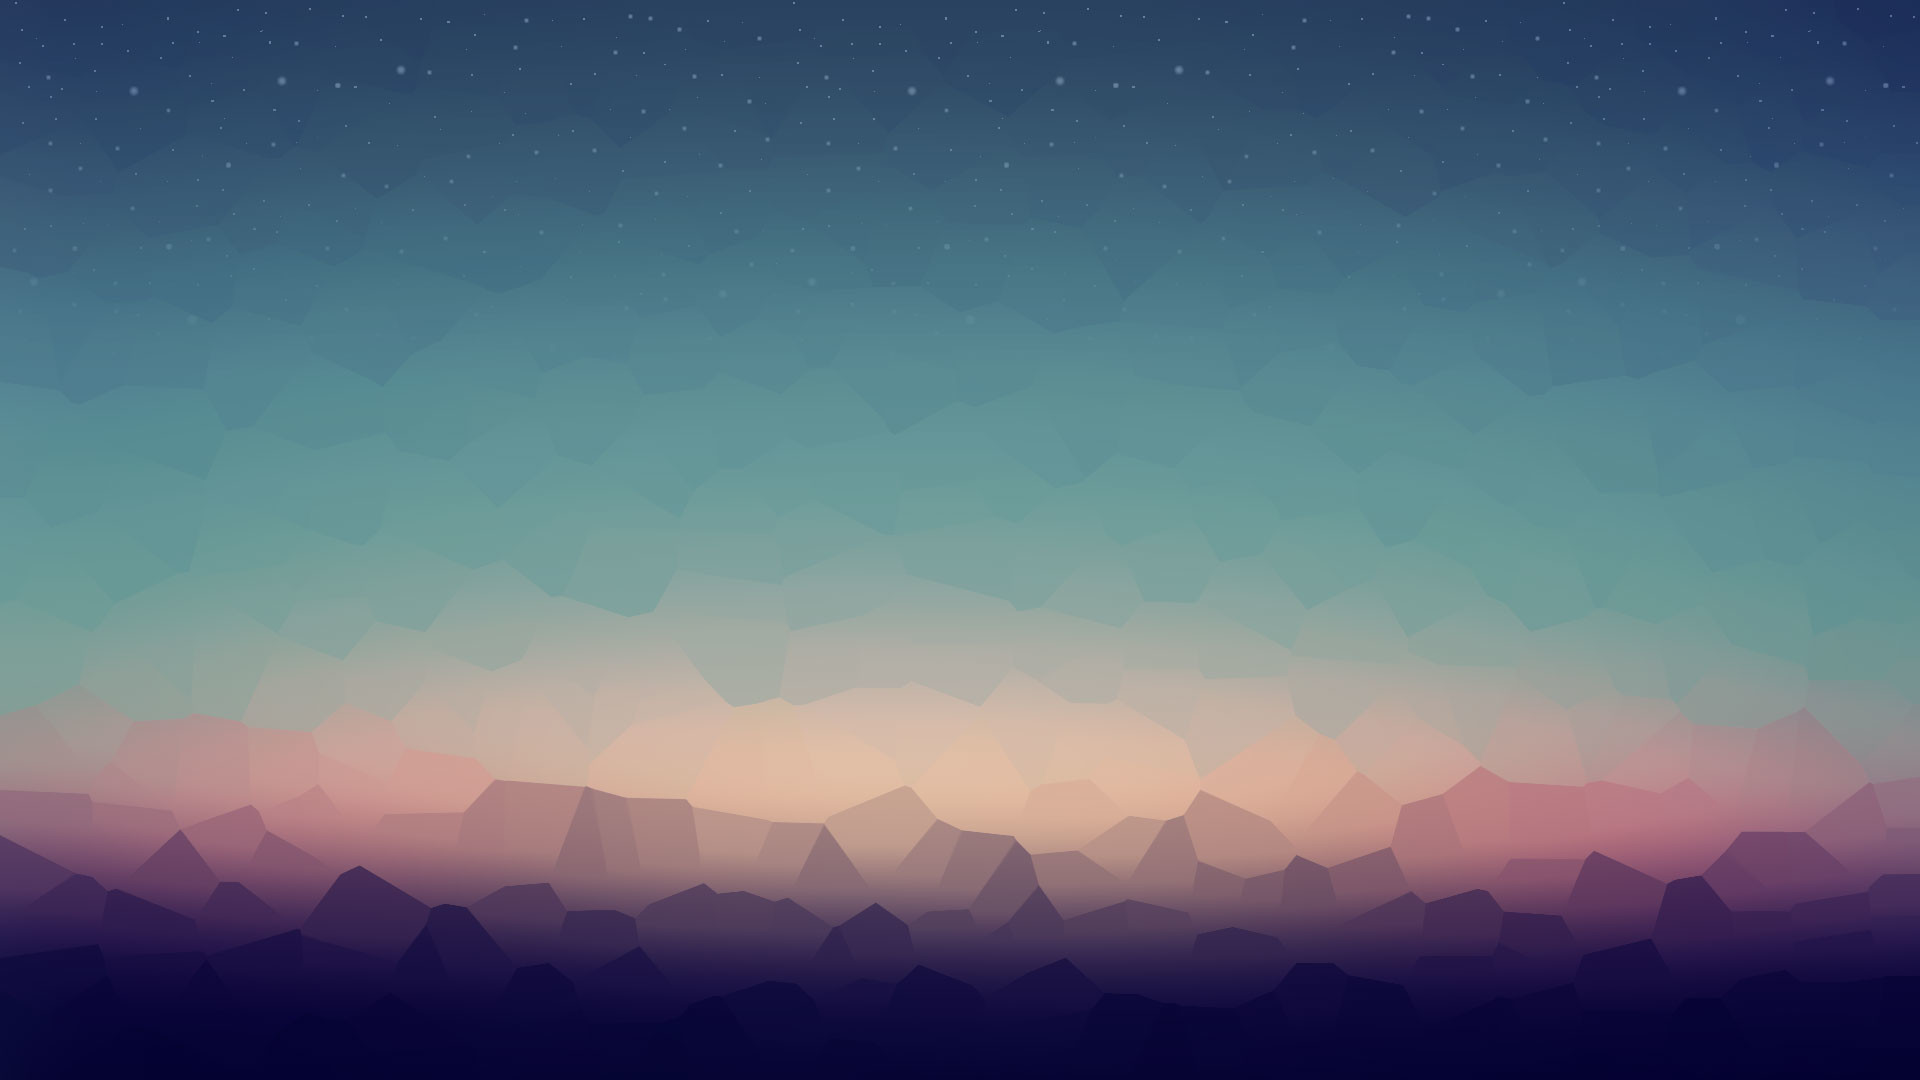 1920x1080 Ceystalhorizon Flat Design Wallpapers HD Free Backgrounds